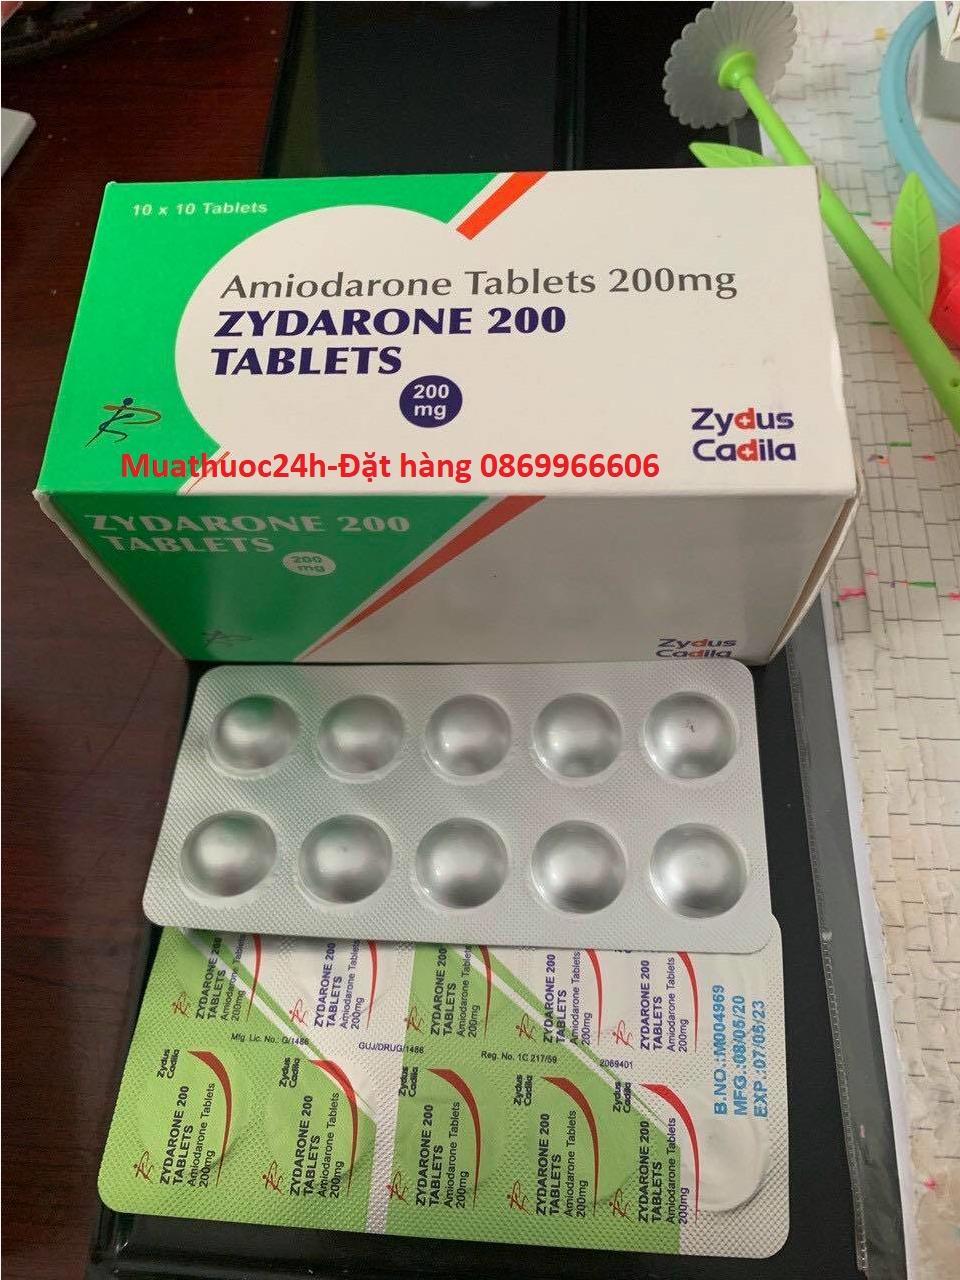 Thuốc Zydarone Amiodarone giá bao nhiêu mua ở đâu?